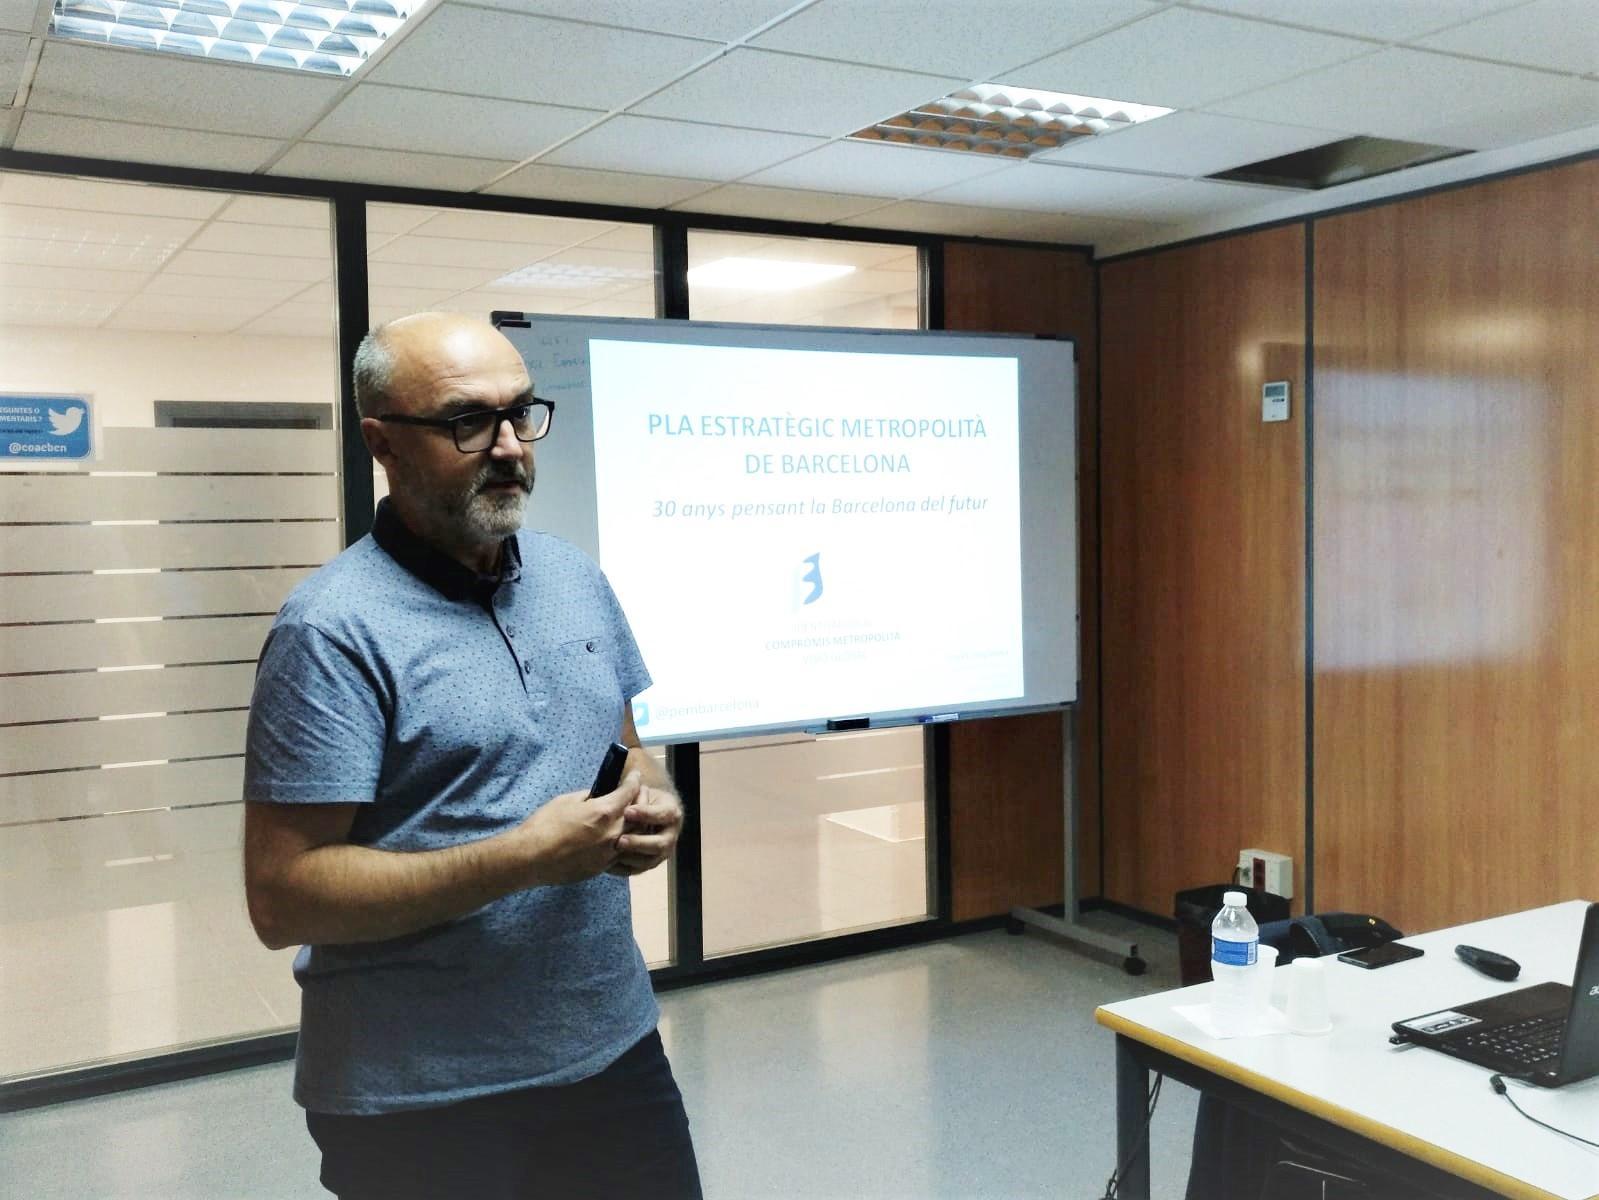 Oriol Estela al inicio de la charla '30 años pensando la Barcelona del futuro'